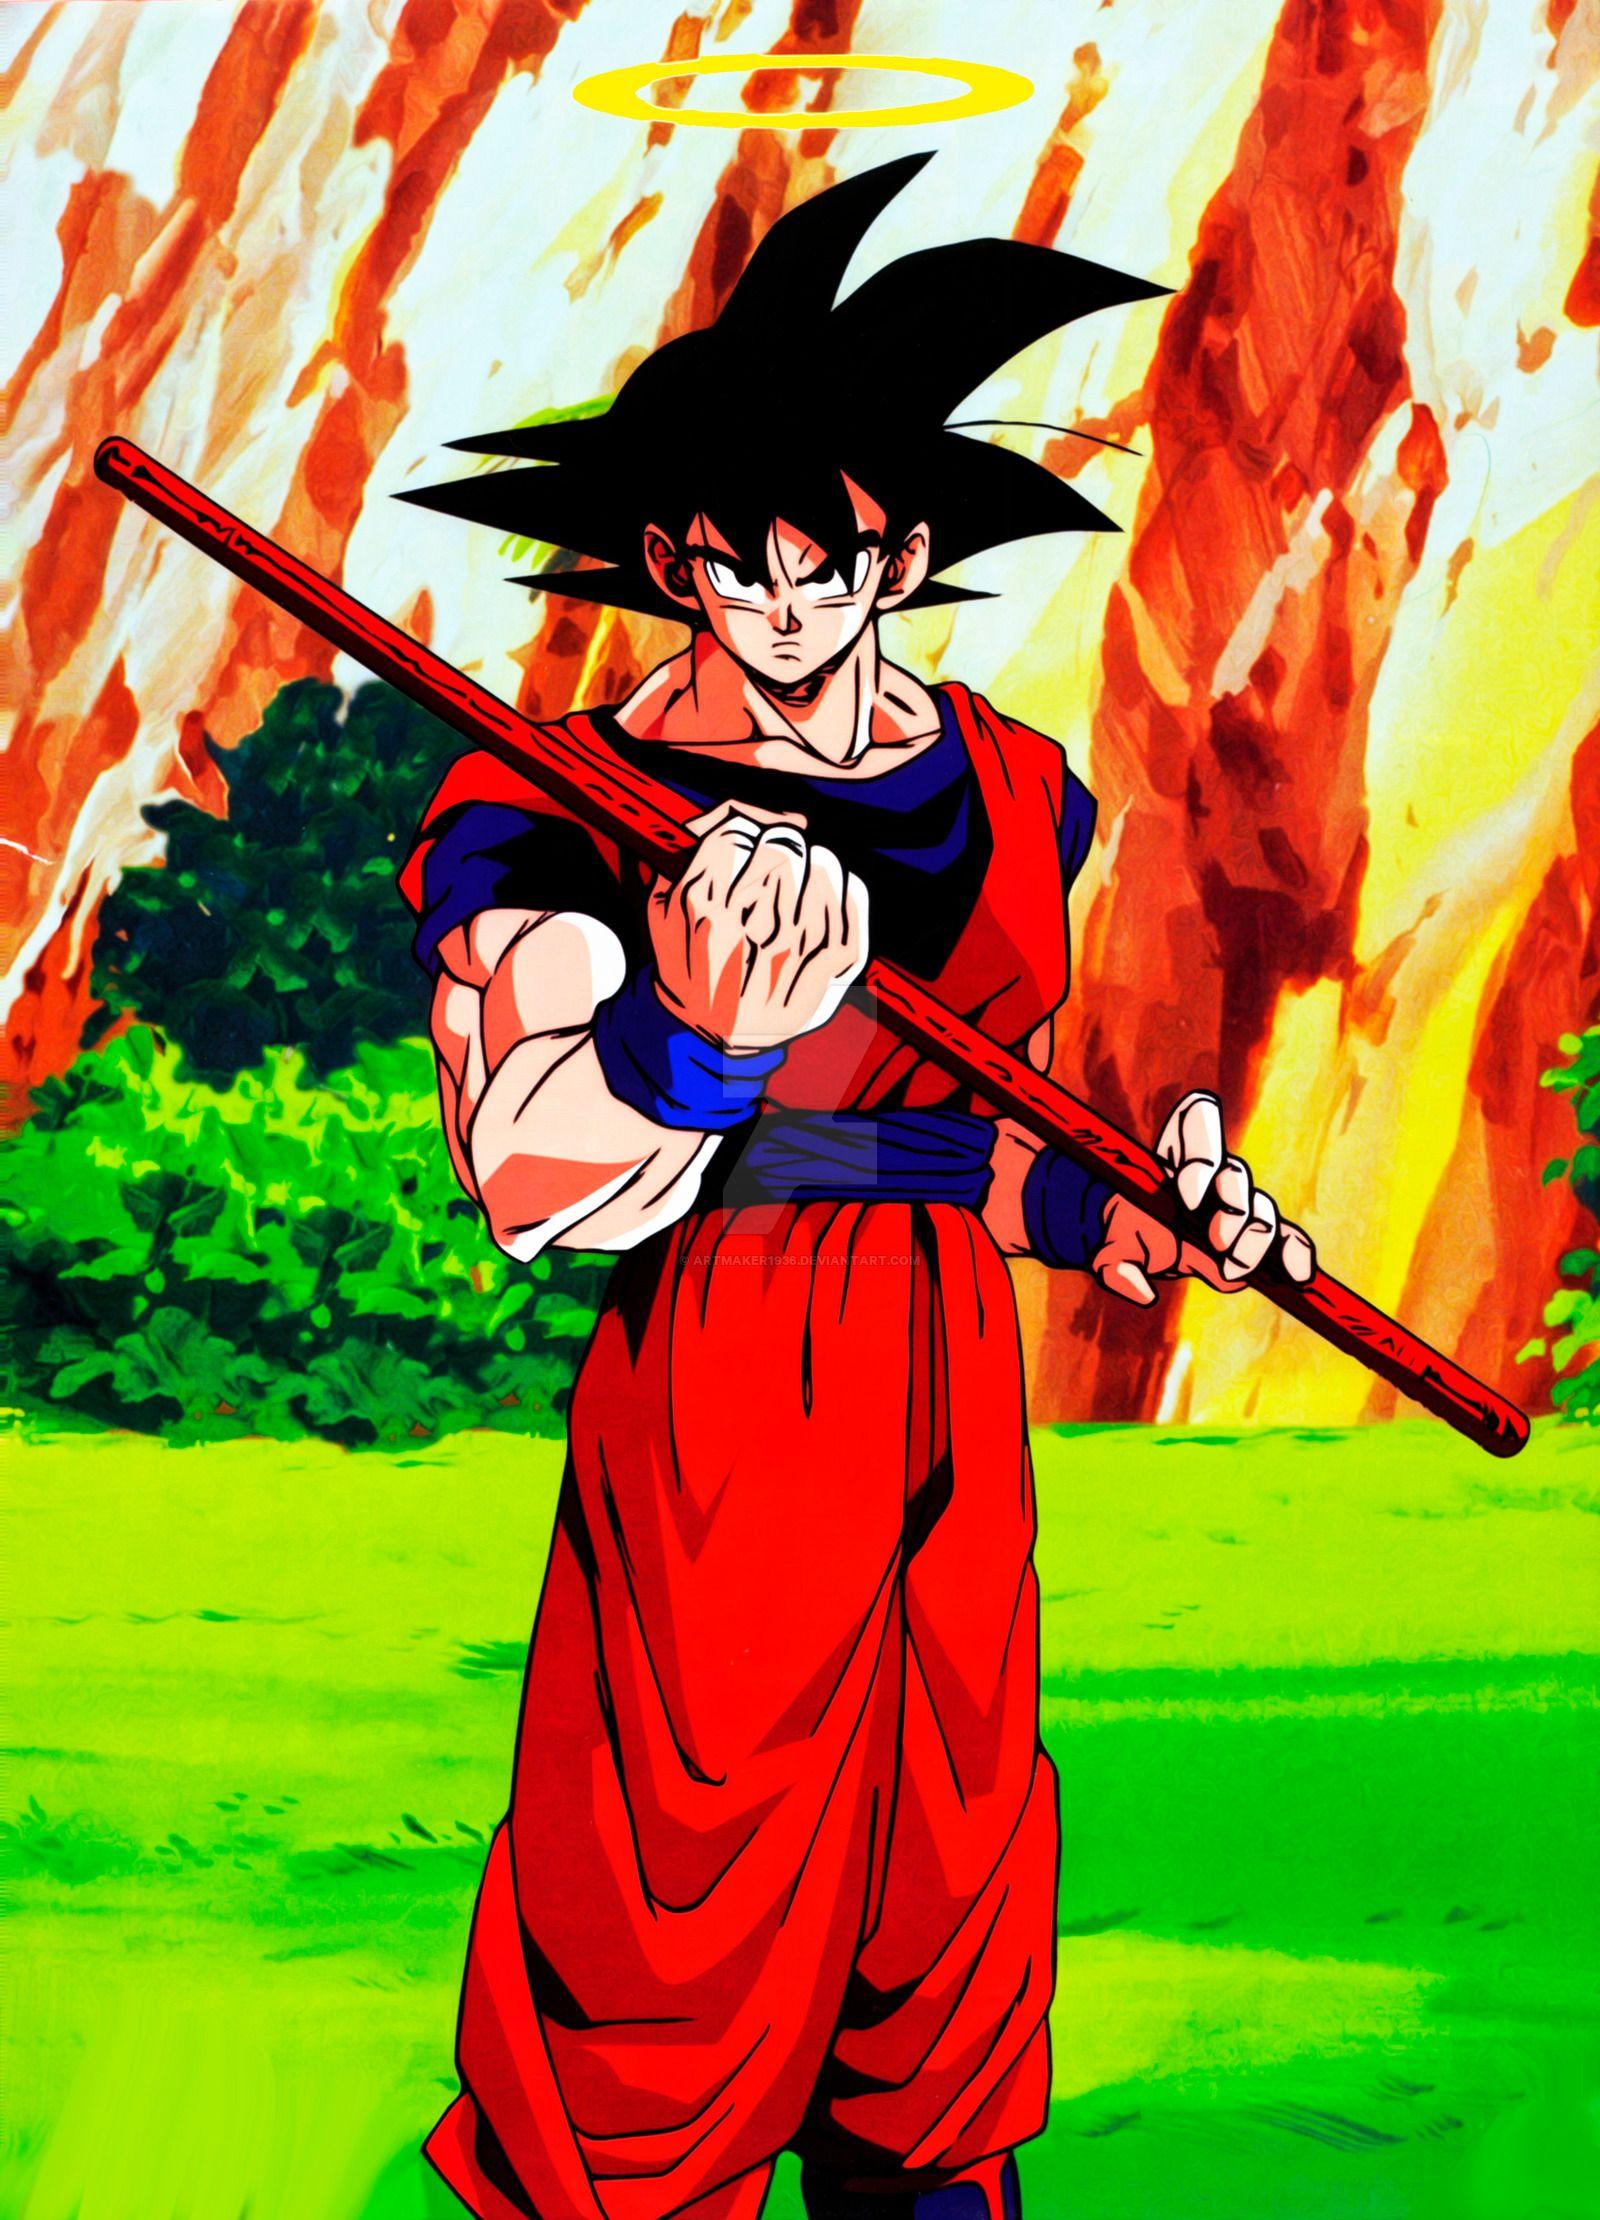 d9954241 Image result for goku training Dbz, Goku And Vegeta, Son Goku, Goku Training